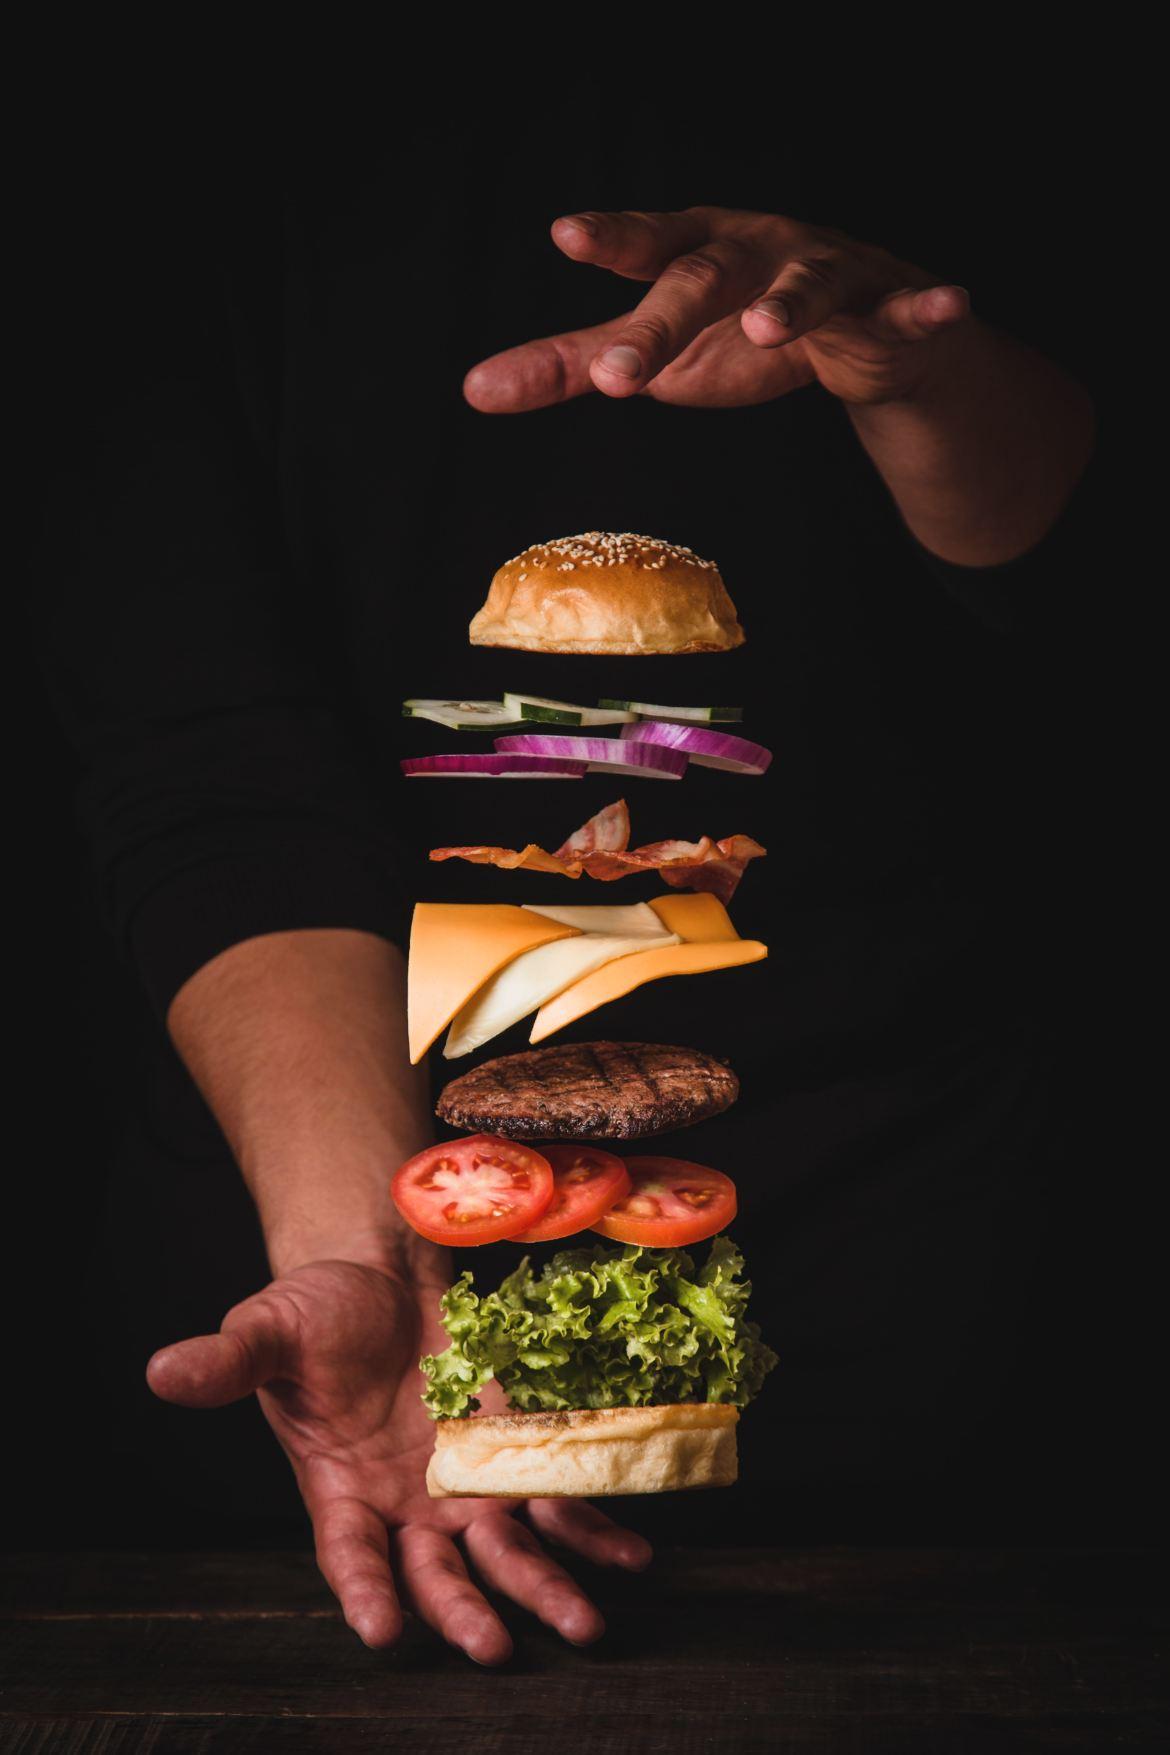 Best Restaurants In Greensboro To Try